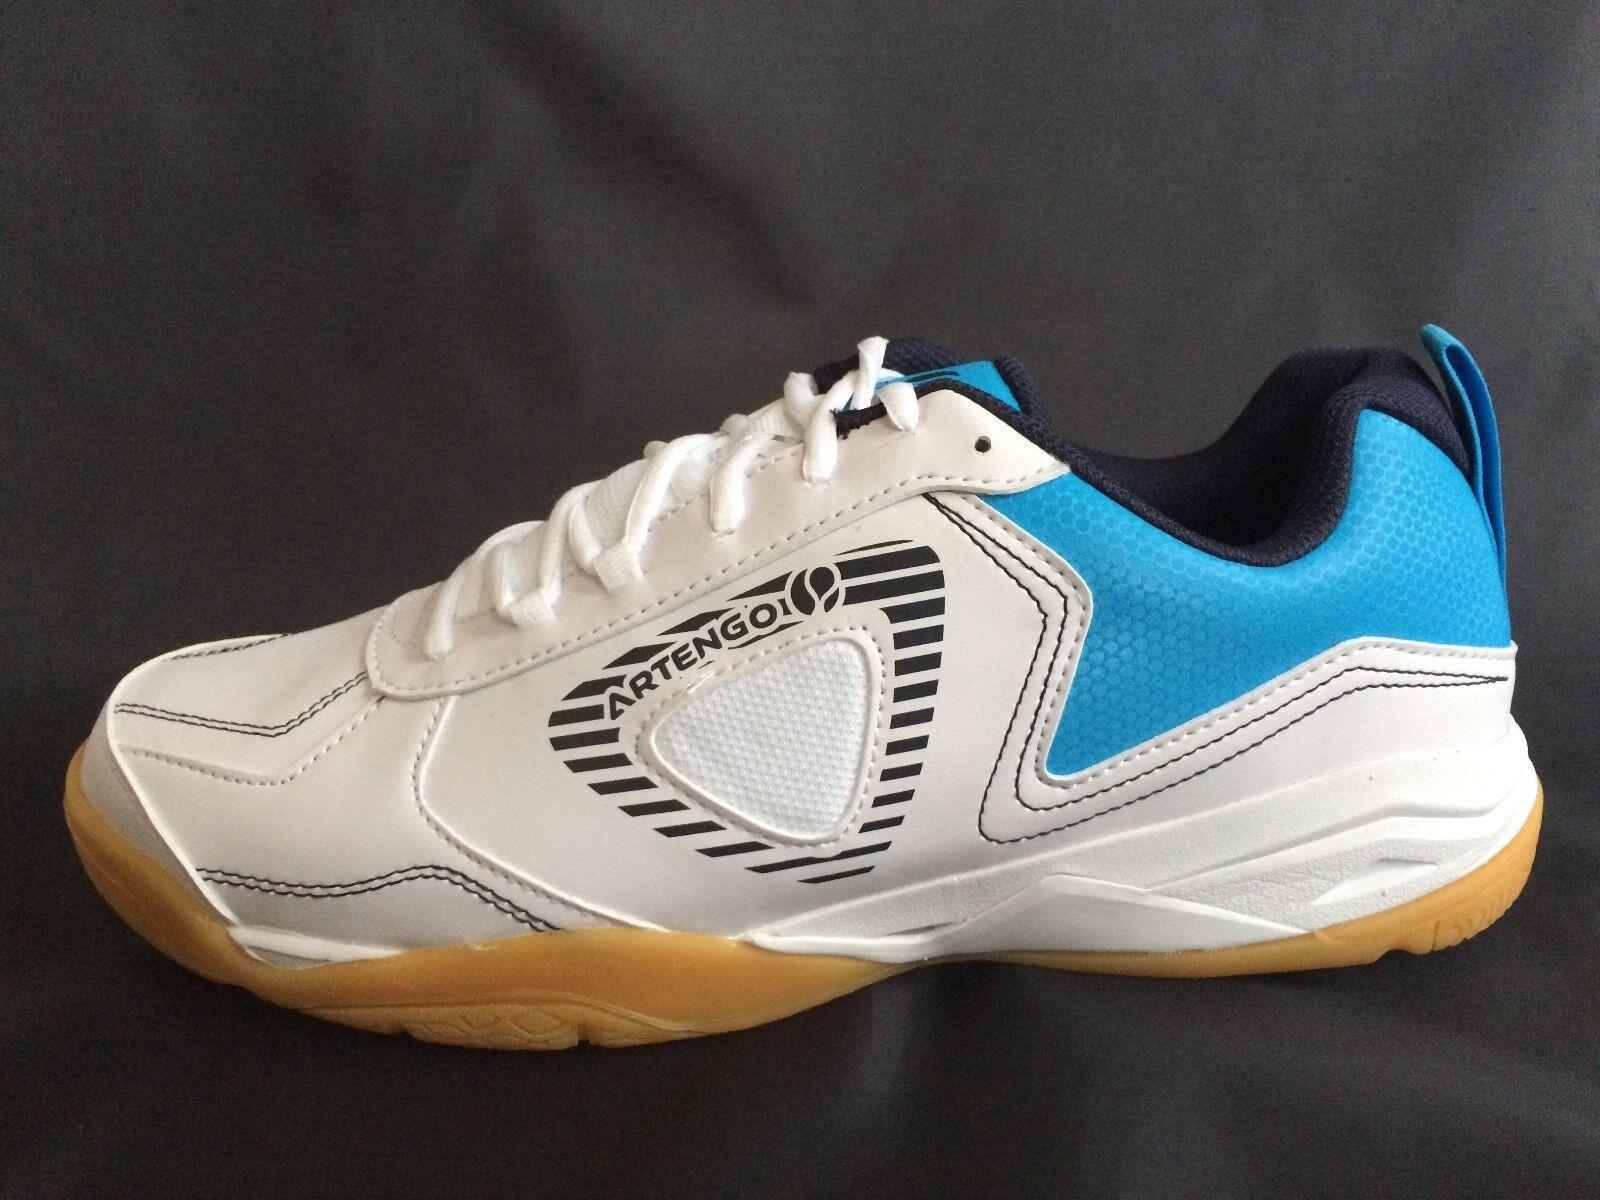 ARTENGO BS720 Hallenschuhe Badminton Squash Herren 45 46 47 48 Turnschuhe weiß